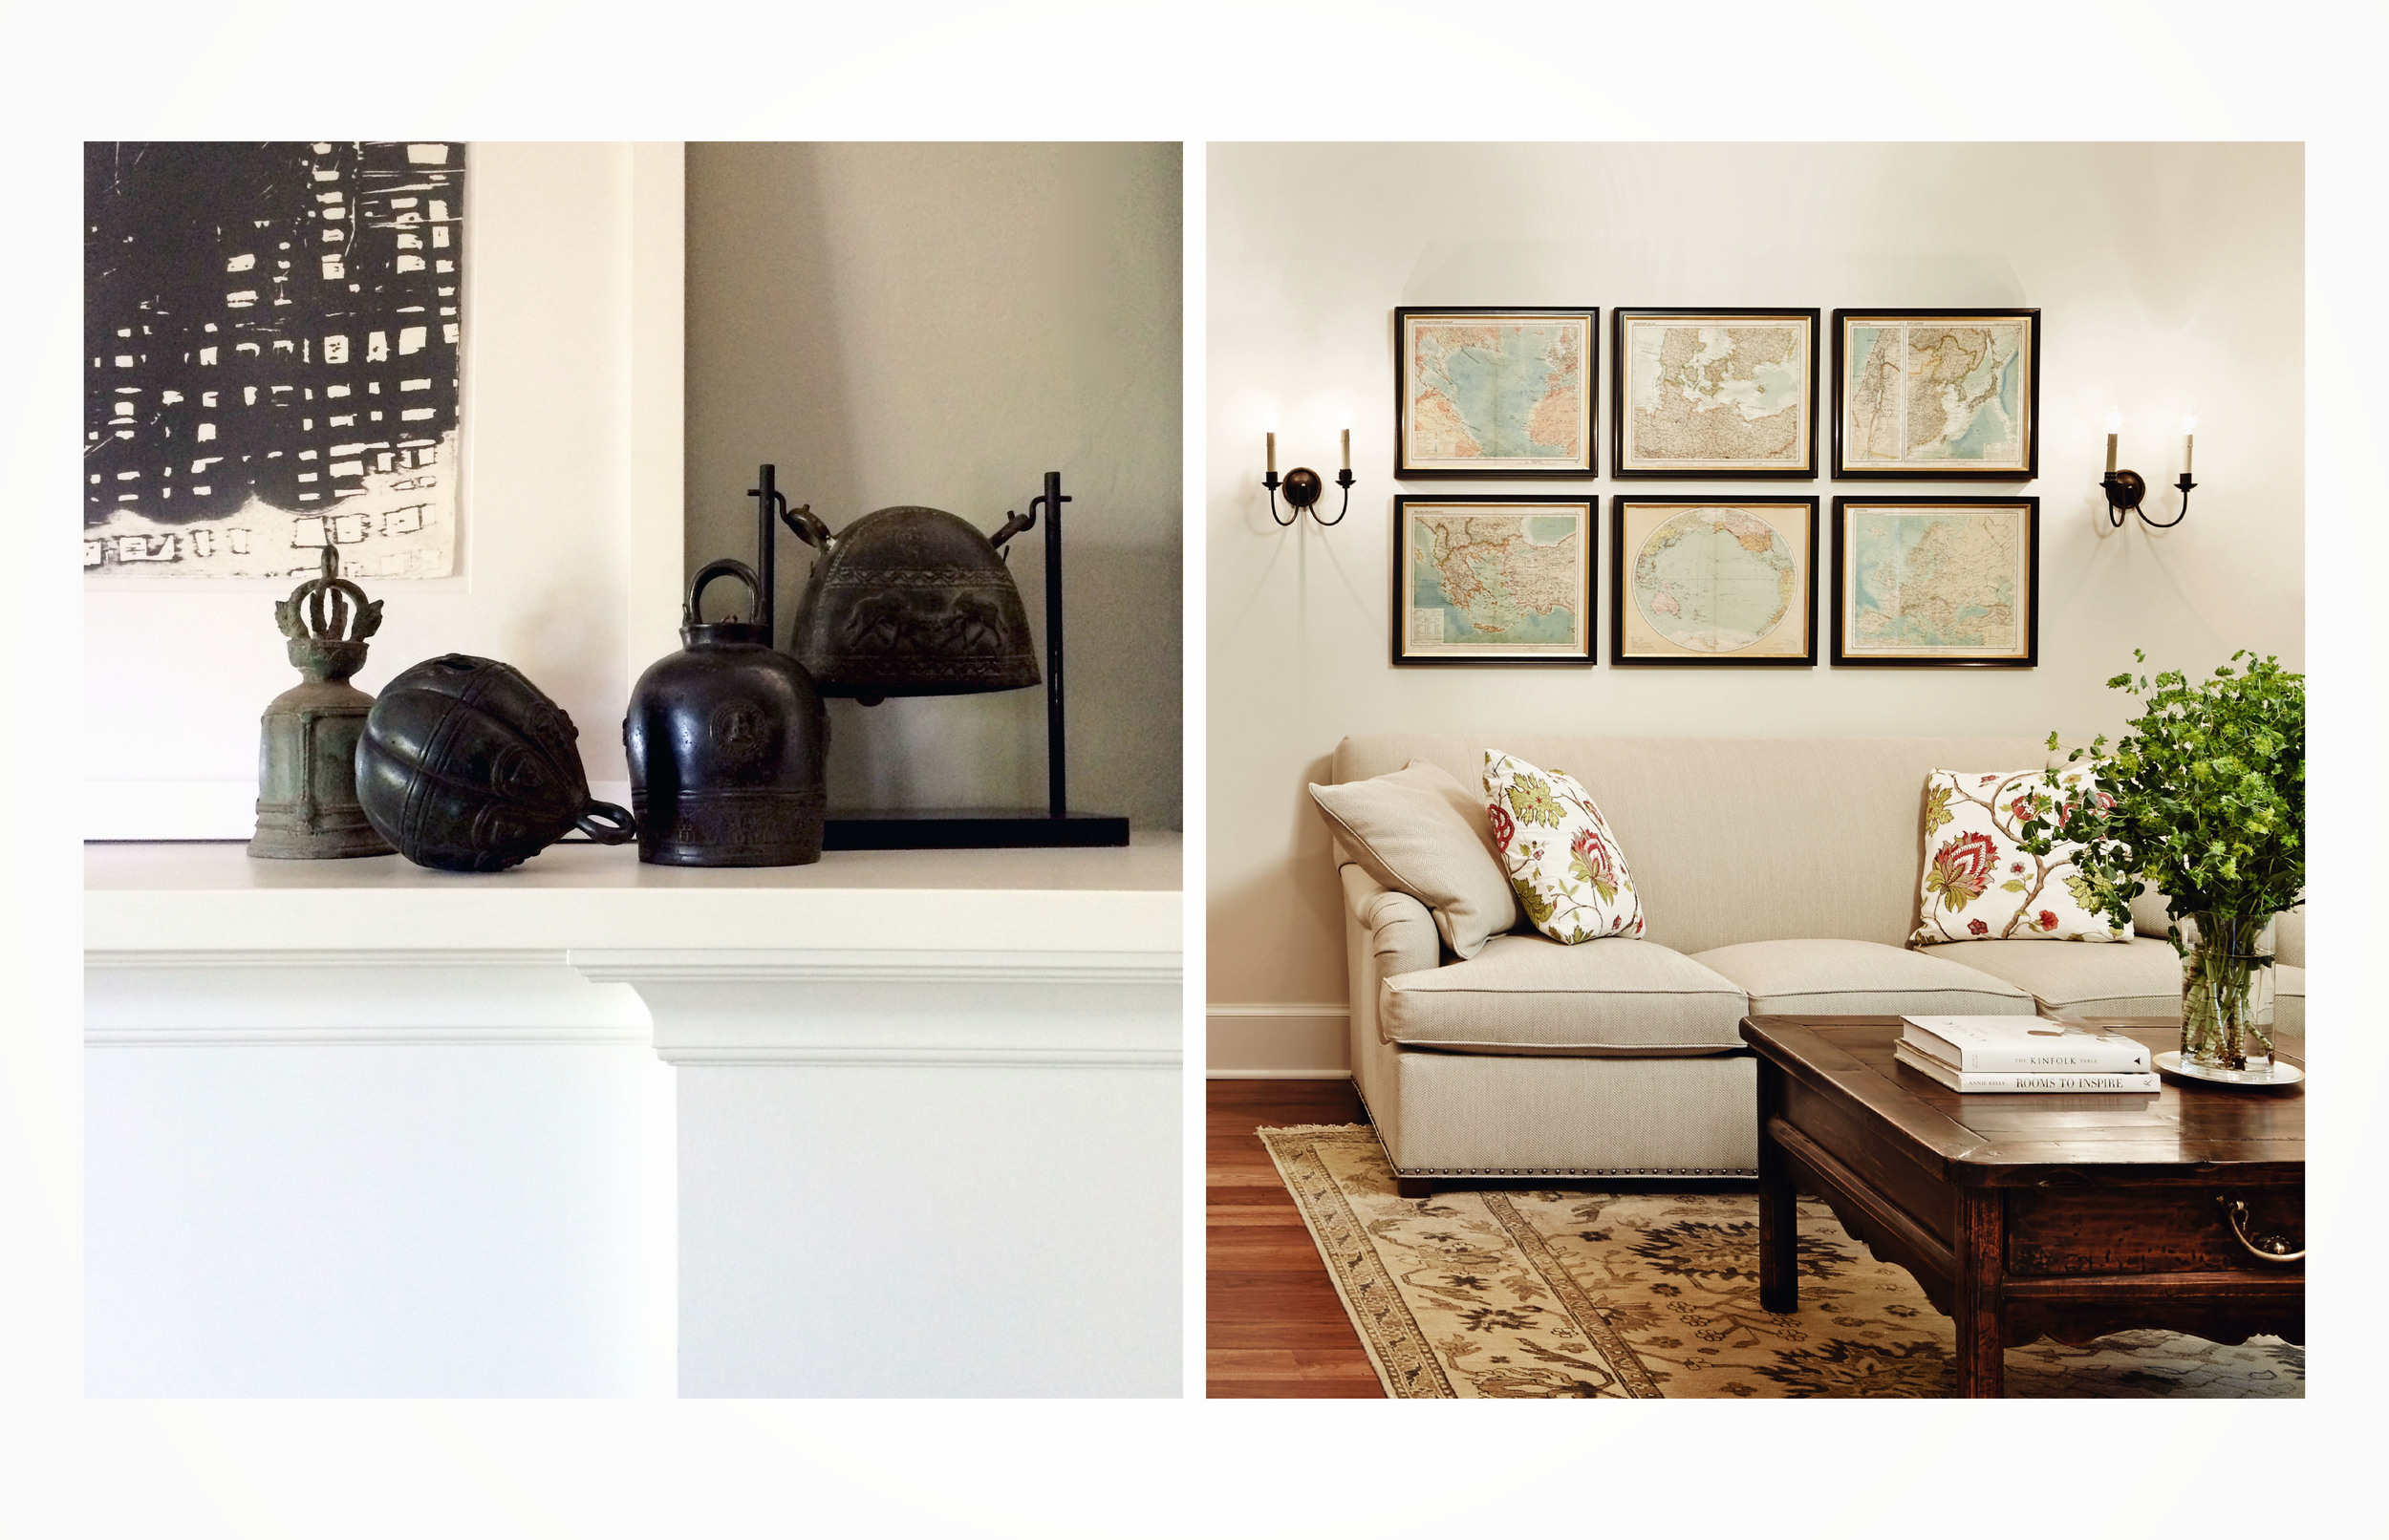 Hyde Evans Design_Blog Post 03 - Groupies_Seattle Interior Design_02.jpg